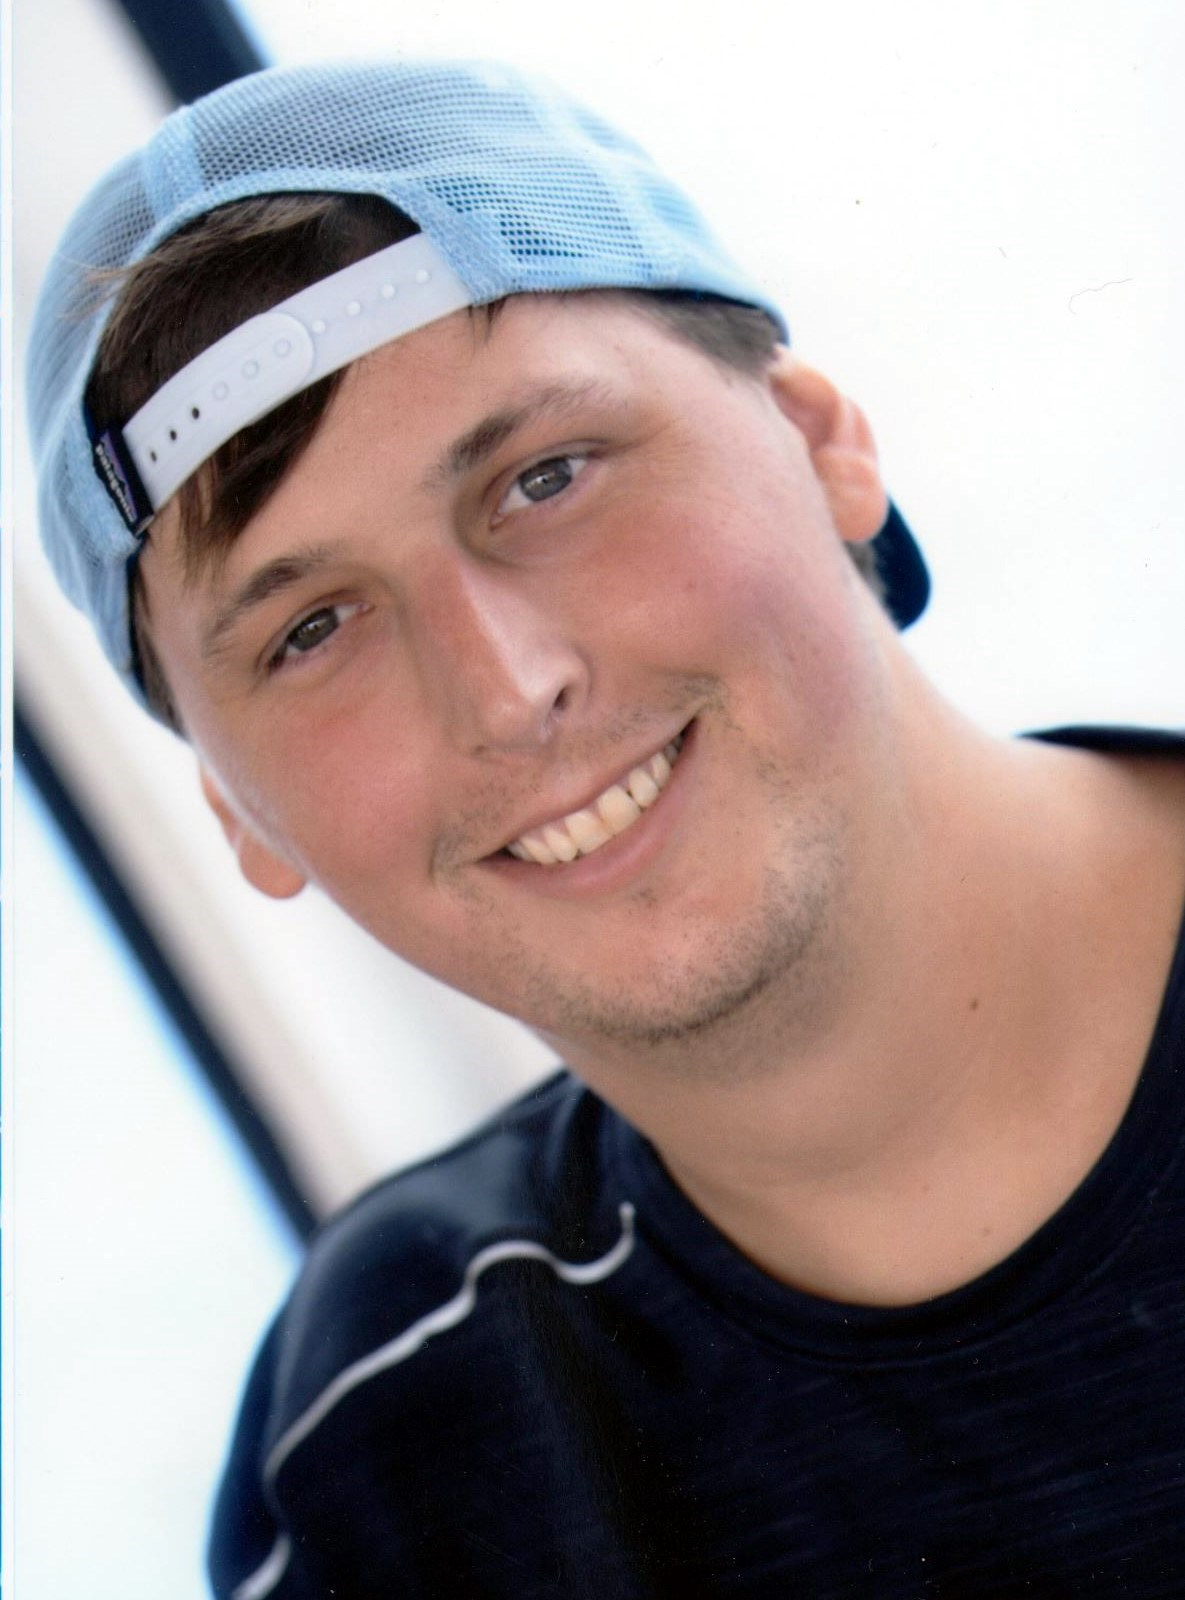 David Jordan Ring IV Obituary - LaGrange, GA